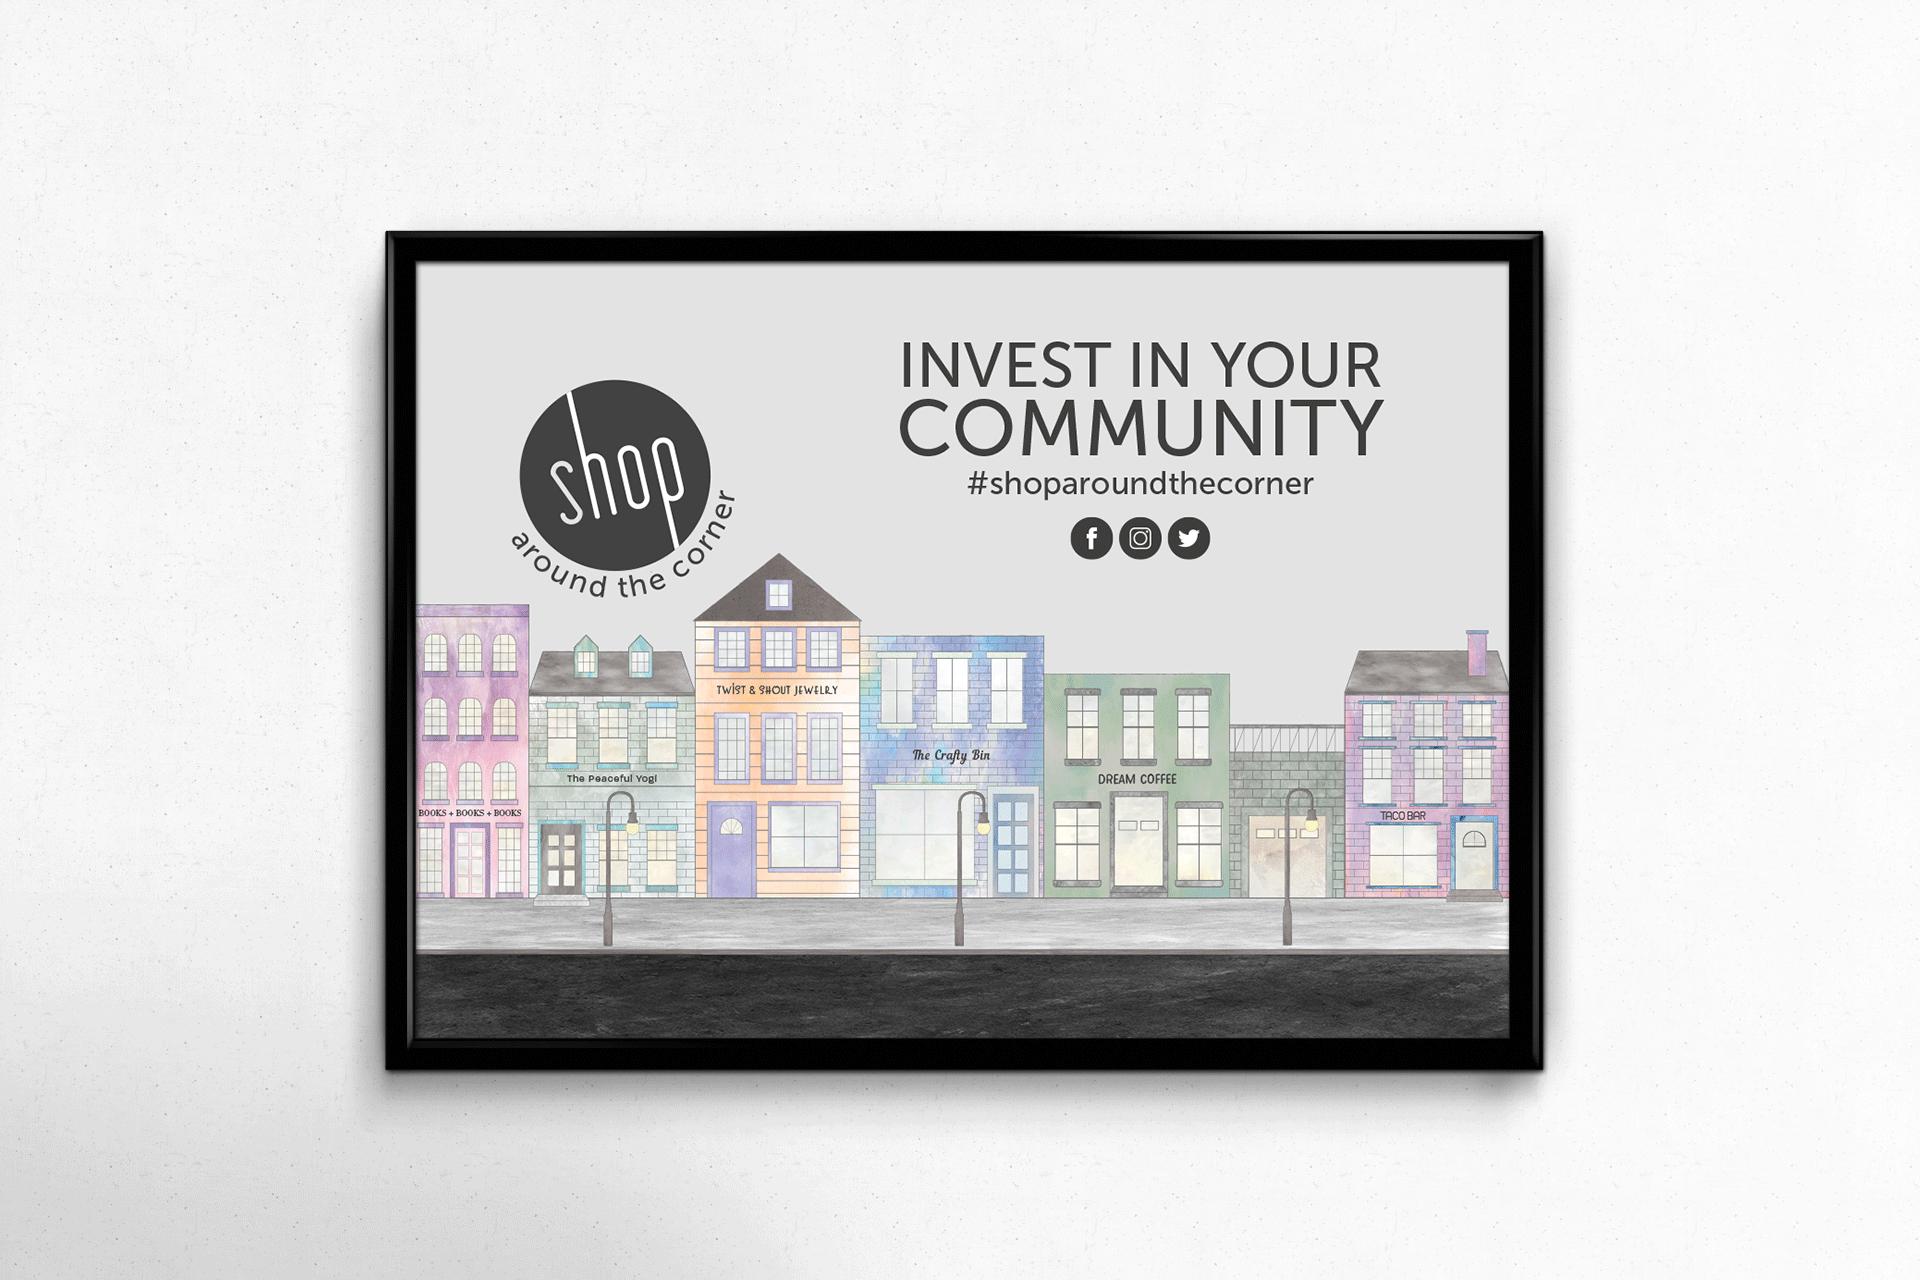 SHOP AROUND THE CORNER - Social Awareness Campaign Design